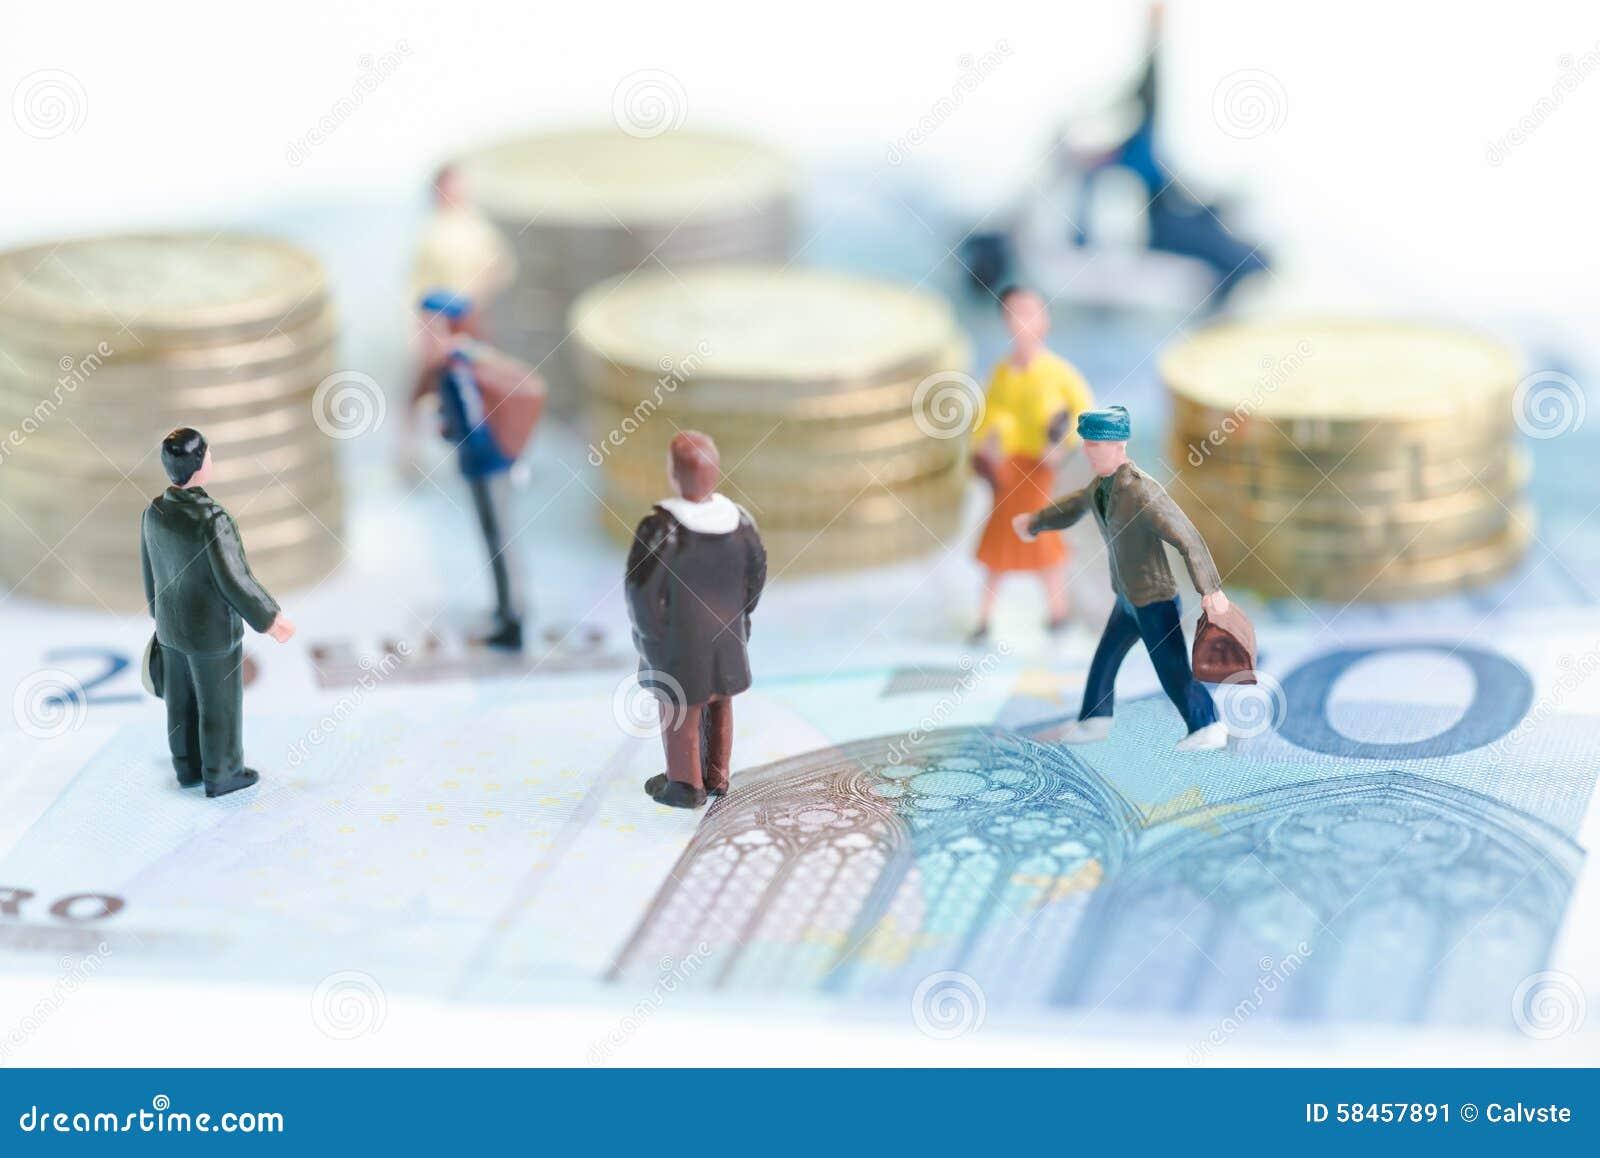 Miniaturleute auf Eurobanknoten